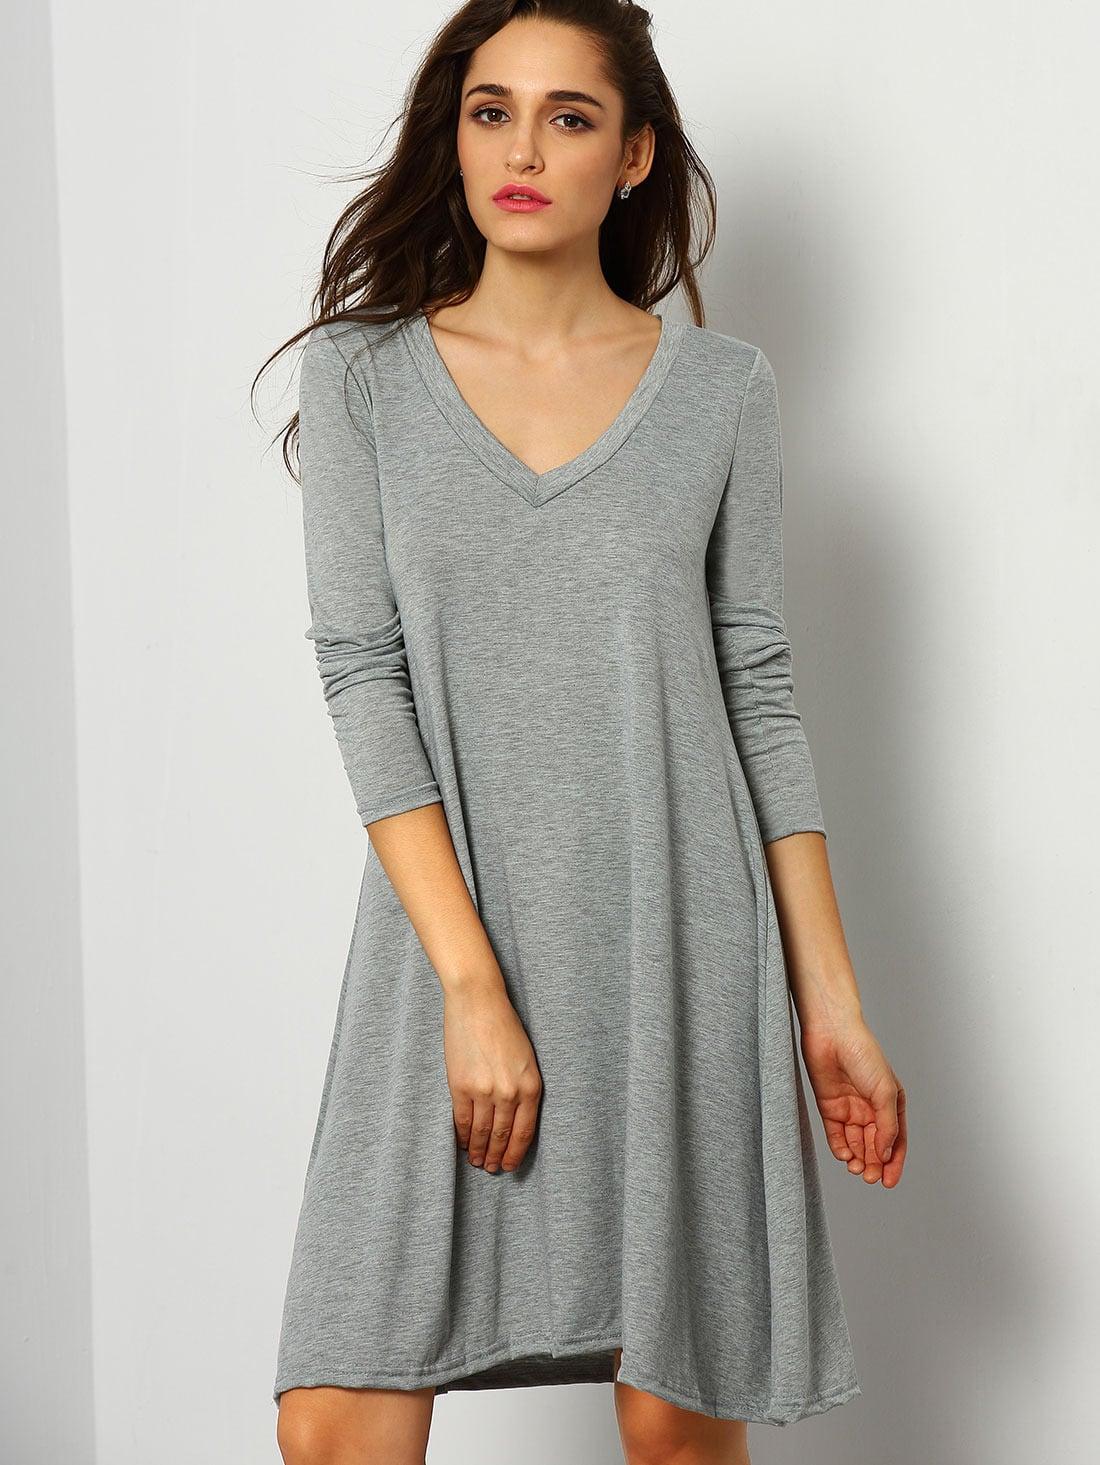 Grey V Neck Long Sleeve Loose Dress -SheIn(Sheinside)